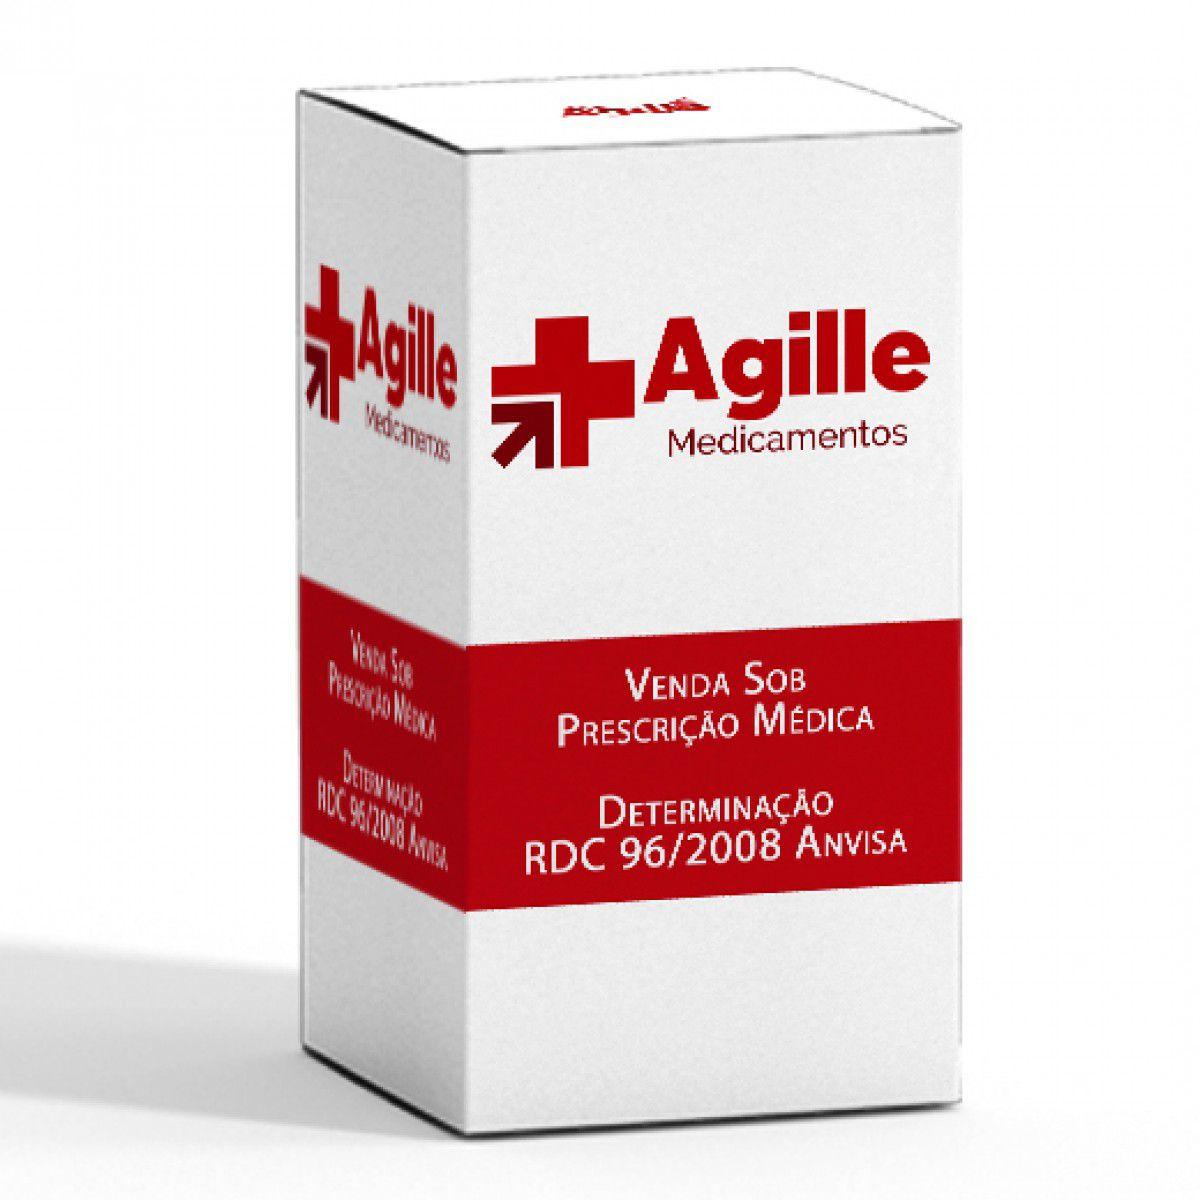 Keytruda 100mg/ml solucao injetavel frasco 4ml  - Agille Speciality